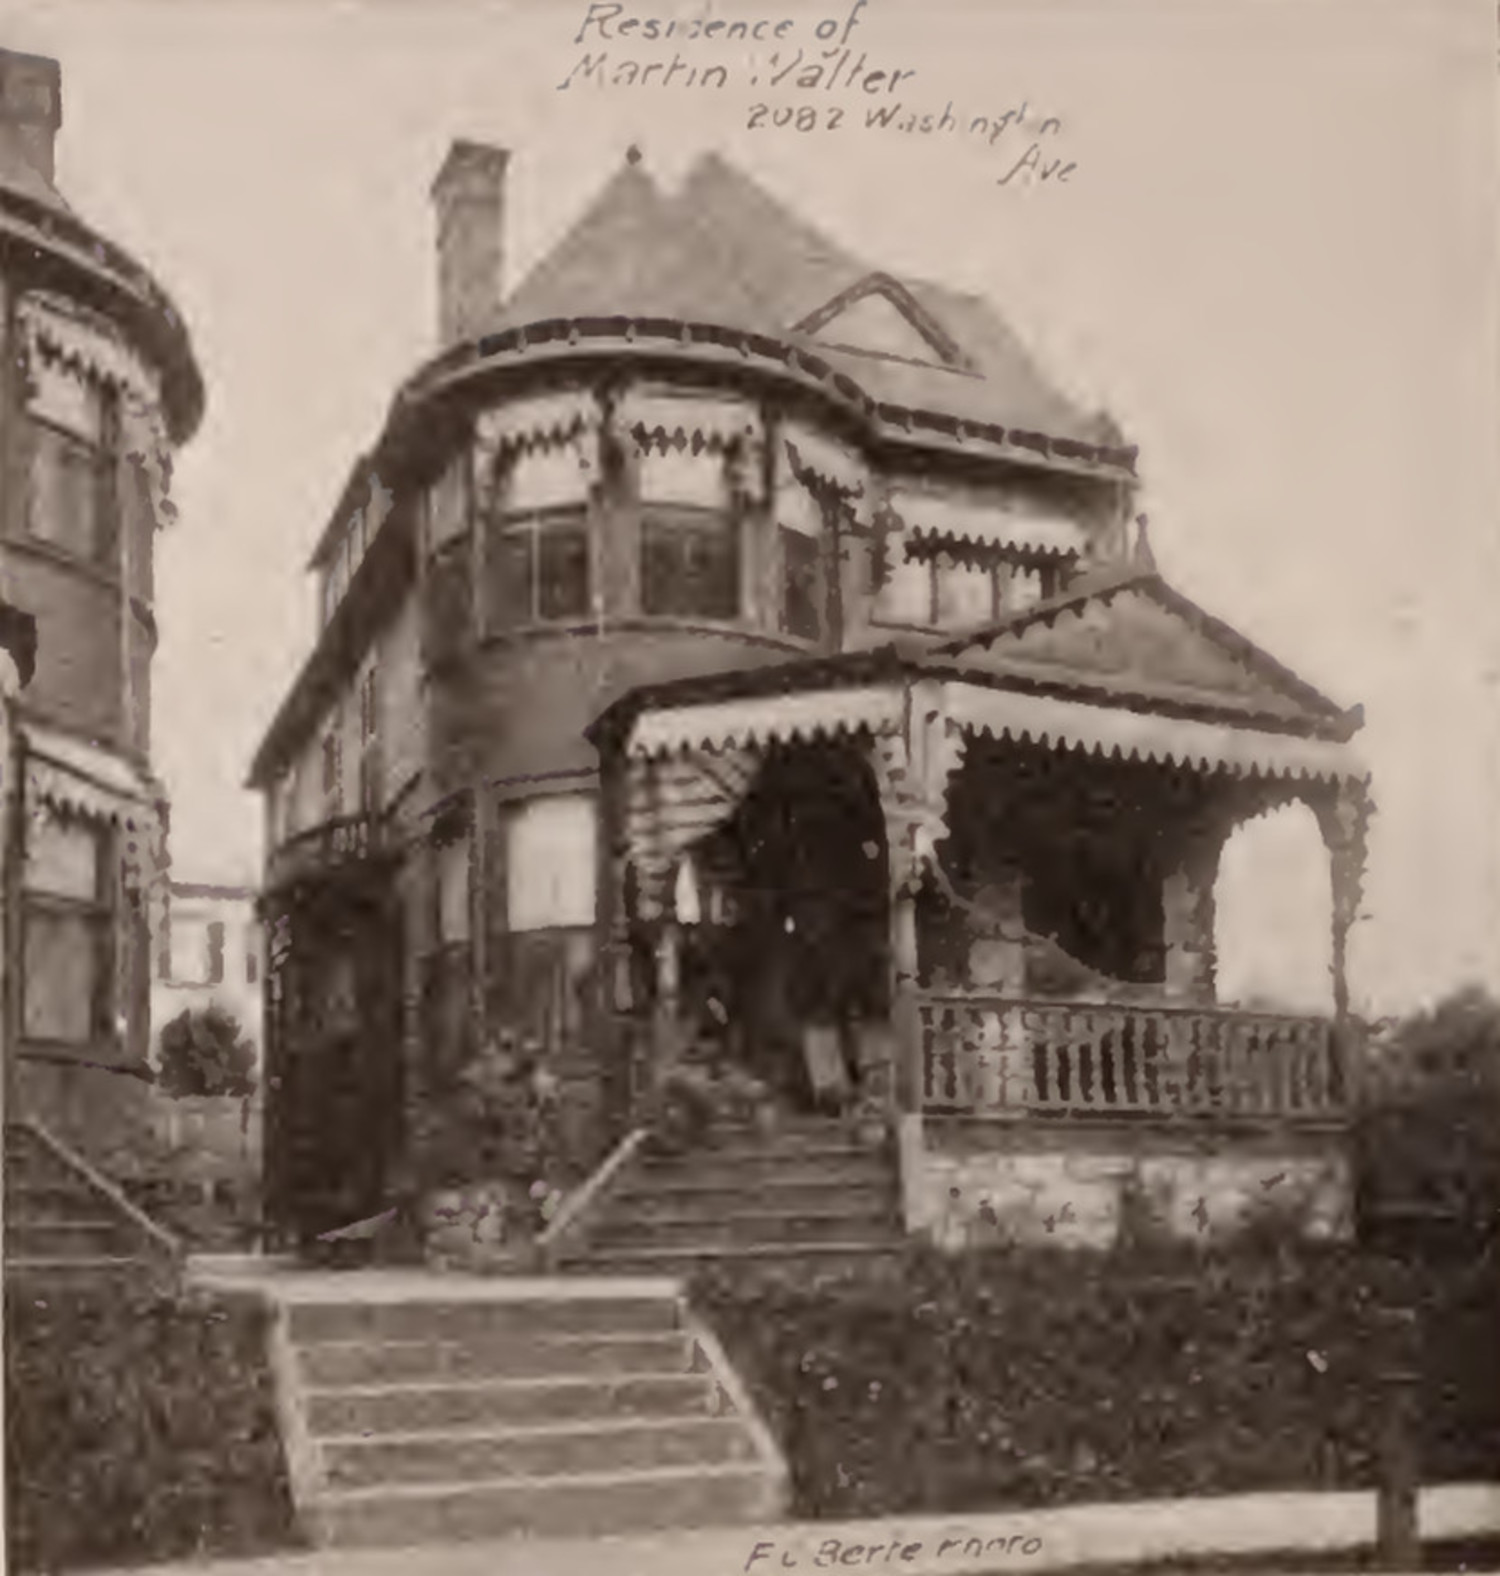 Martin Walter residence 2082 Washington Avenue Bronx 1897